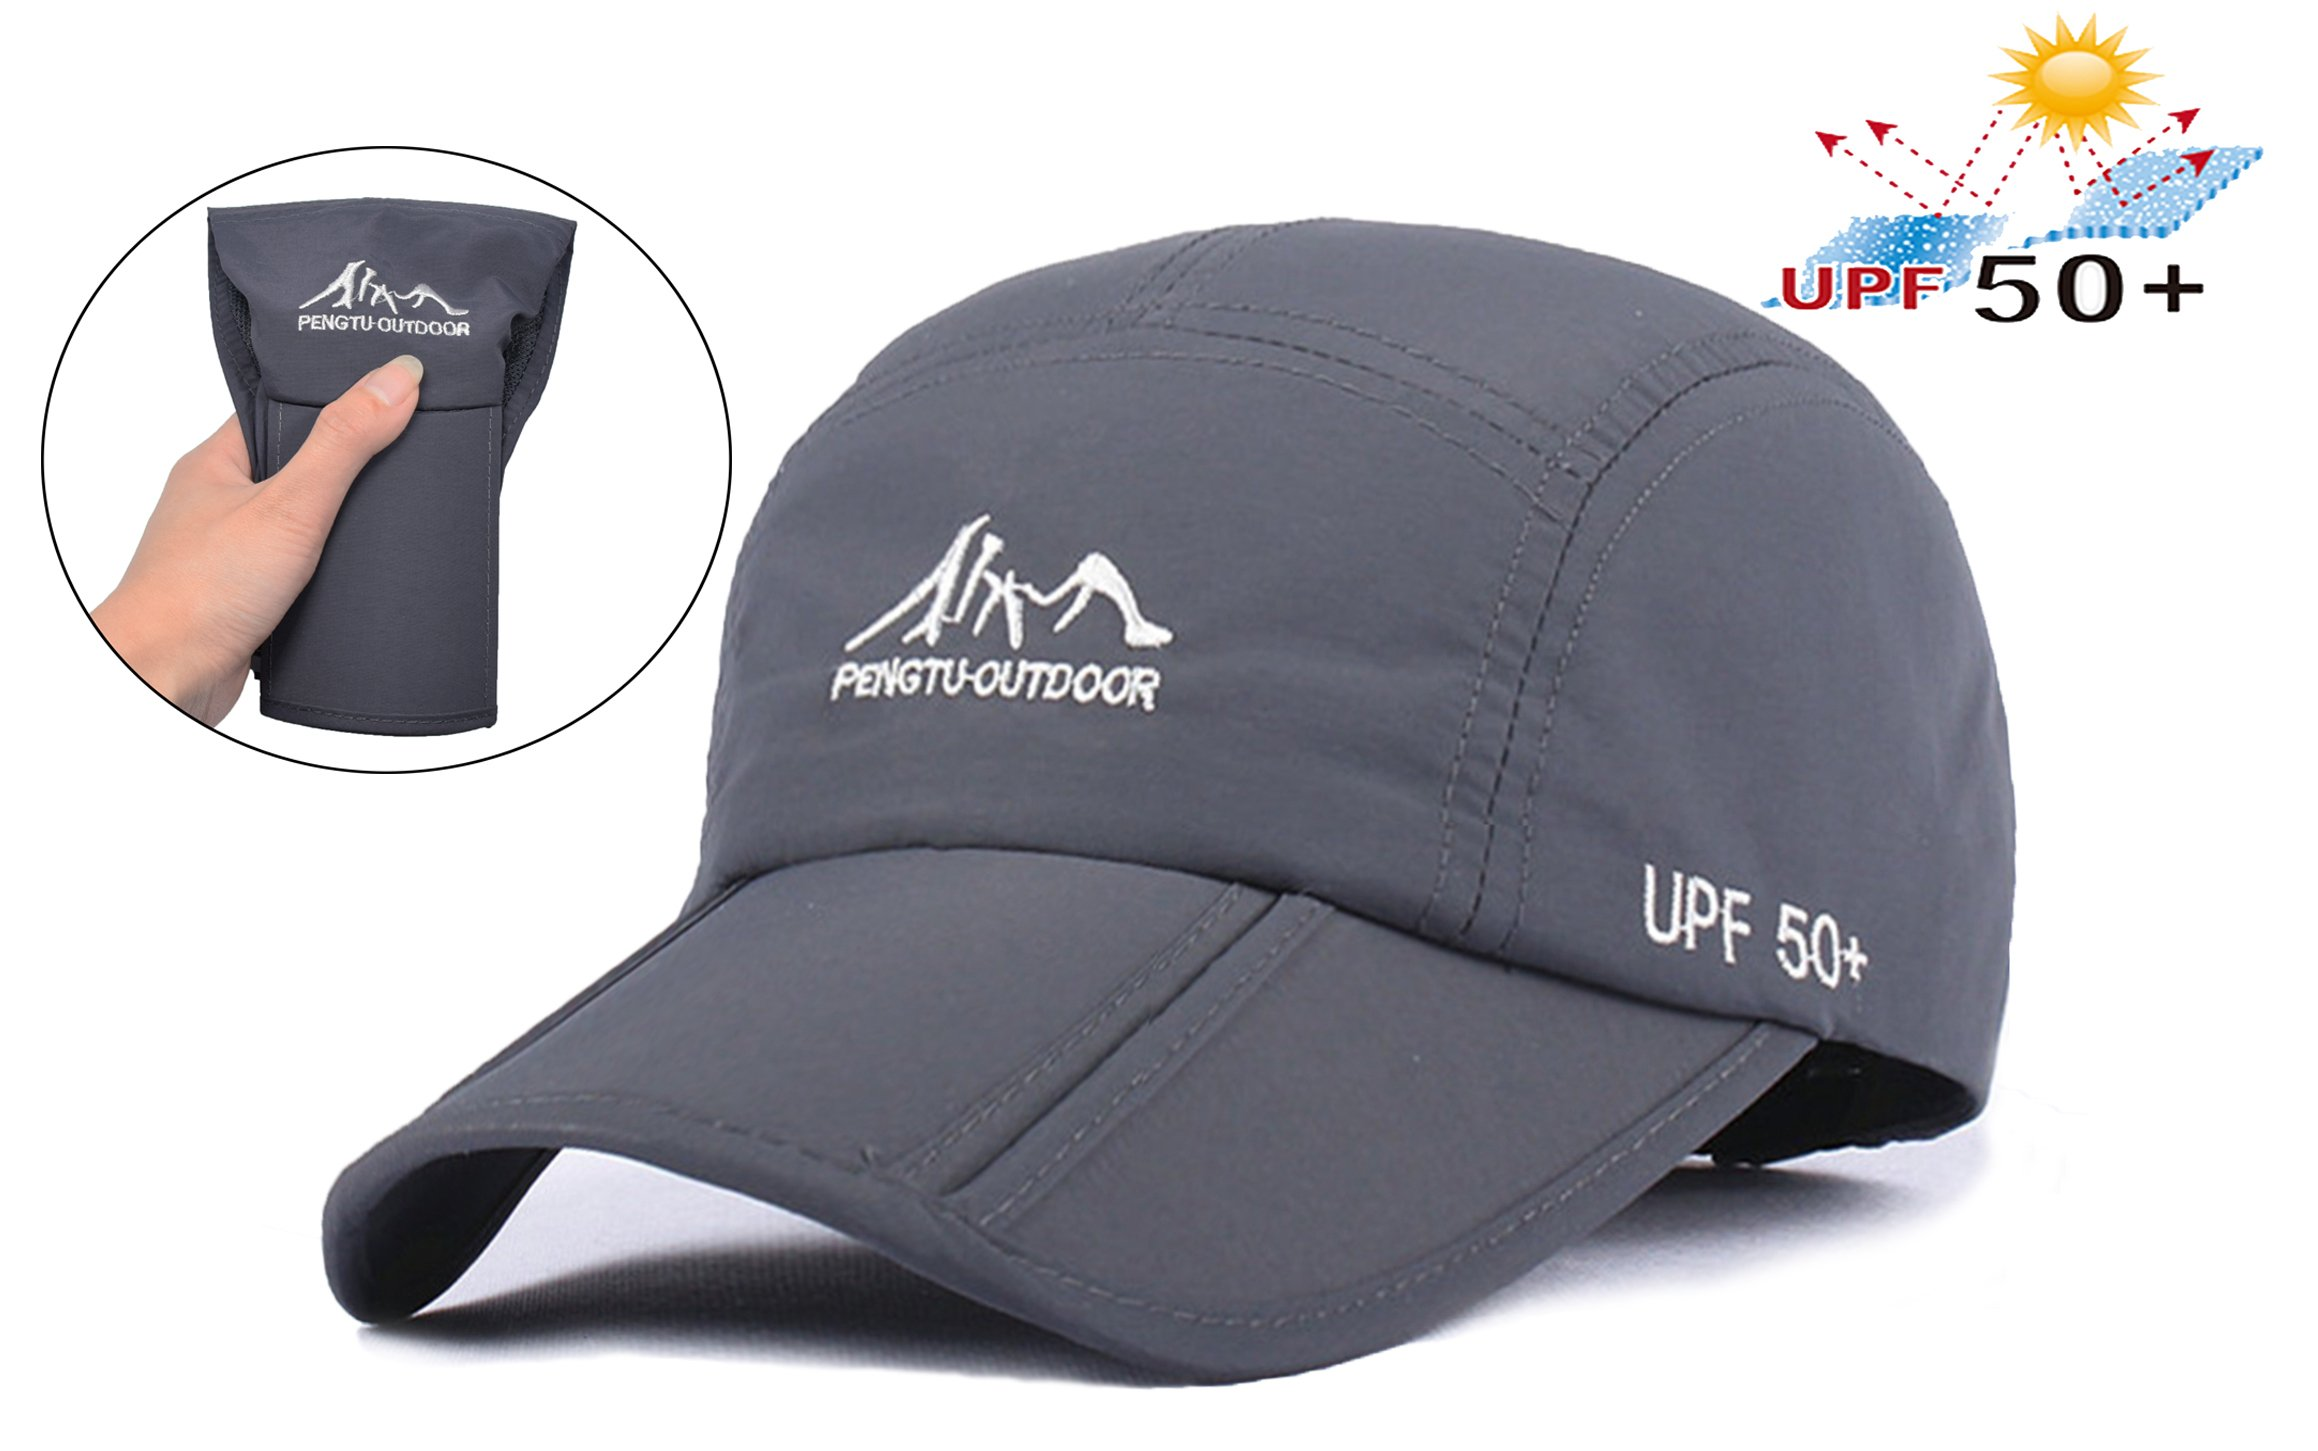 ELLEWIN Baseball Cap Quick Dry Travel Hats UPF50+ Cooling Portable Sun Hats  for Sports Golf Running ea30a115b72